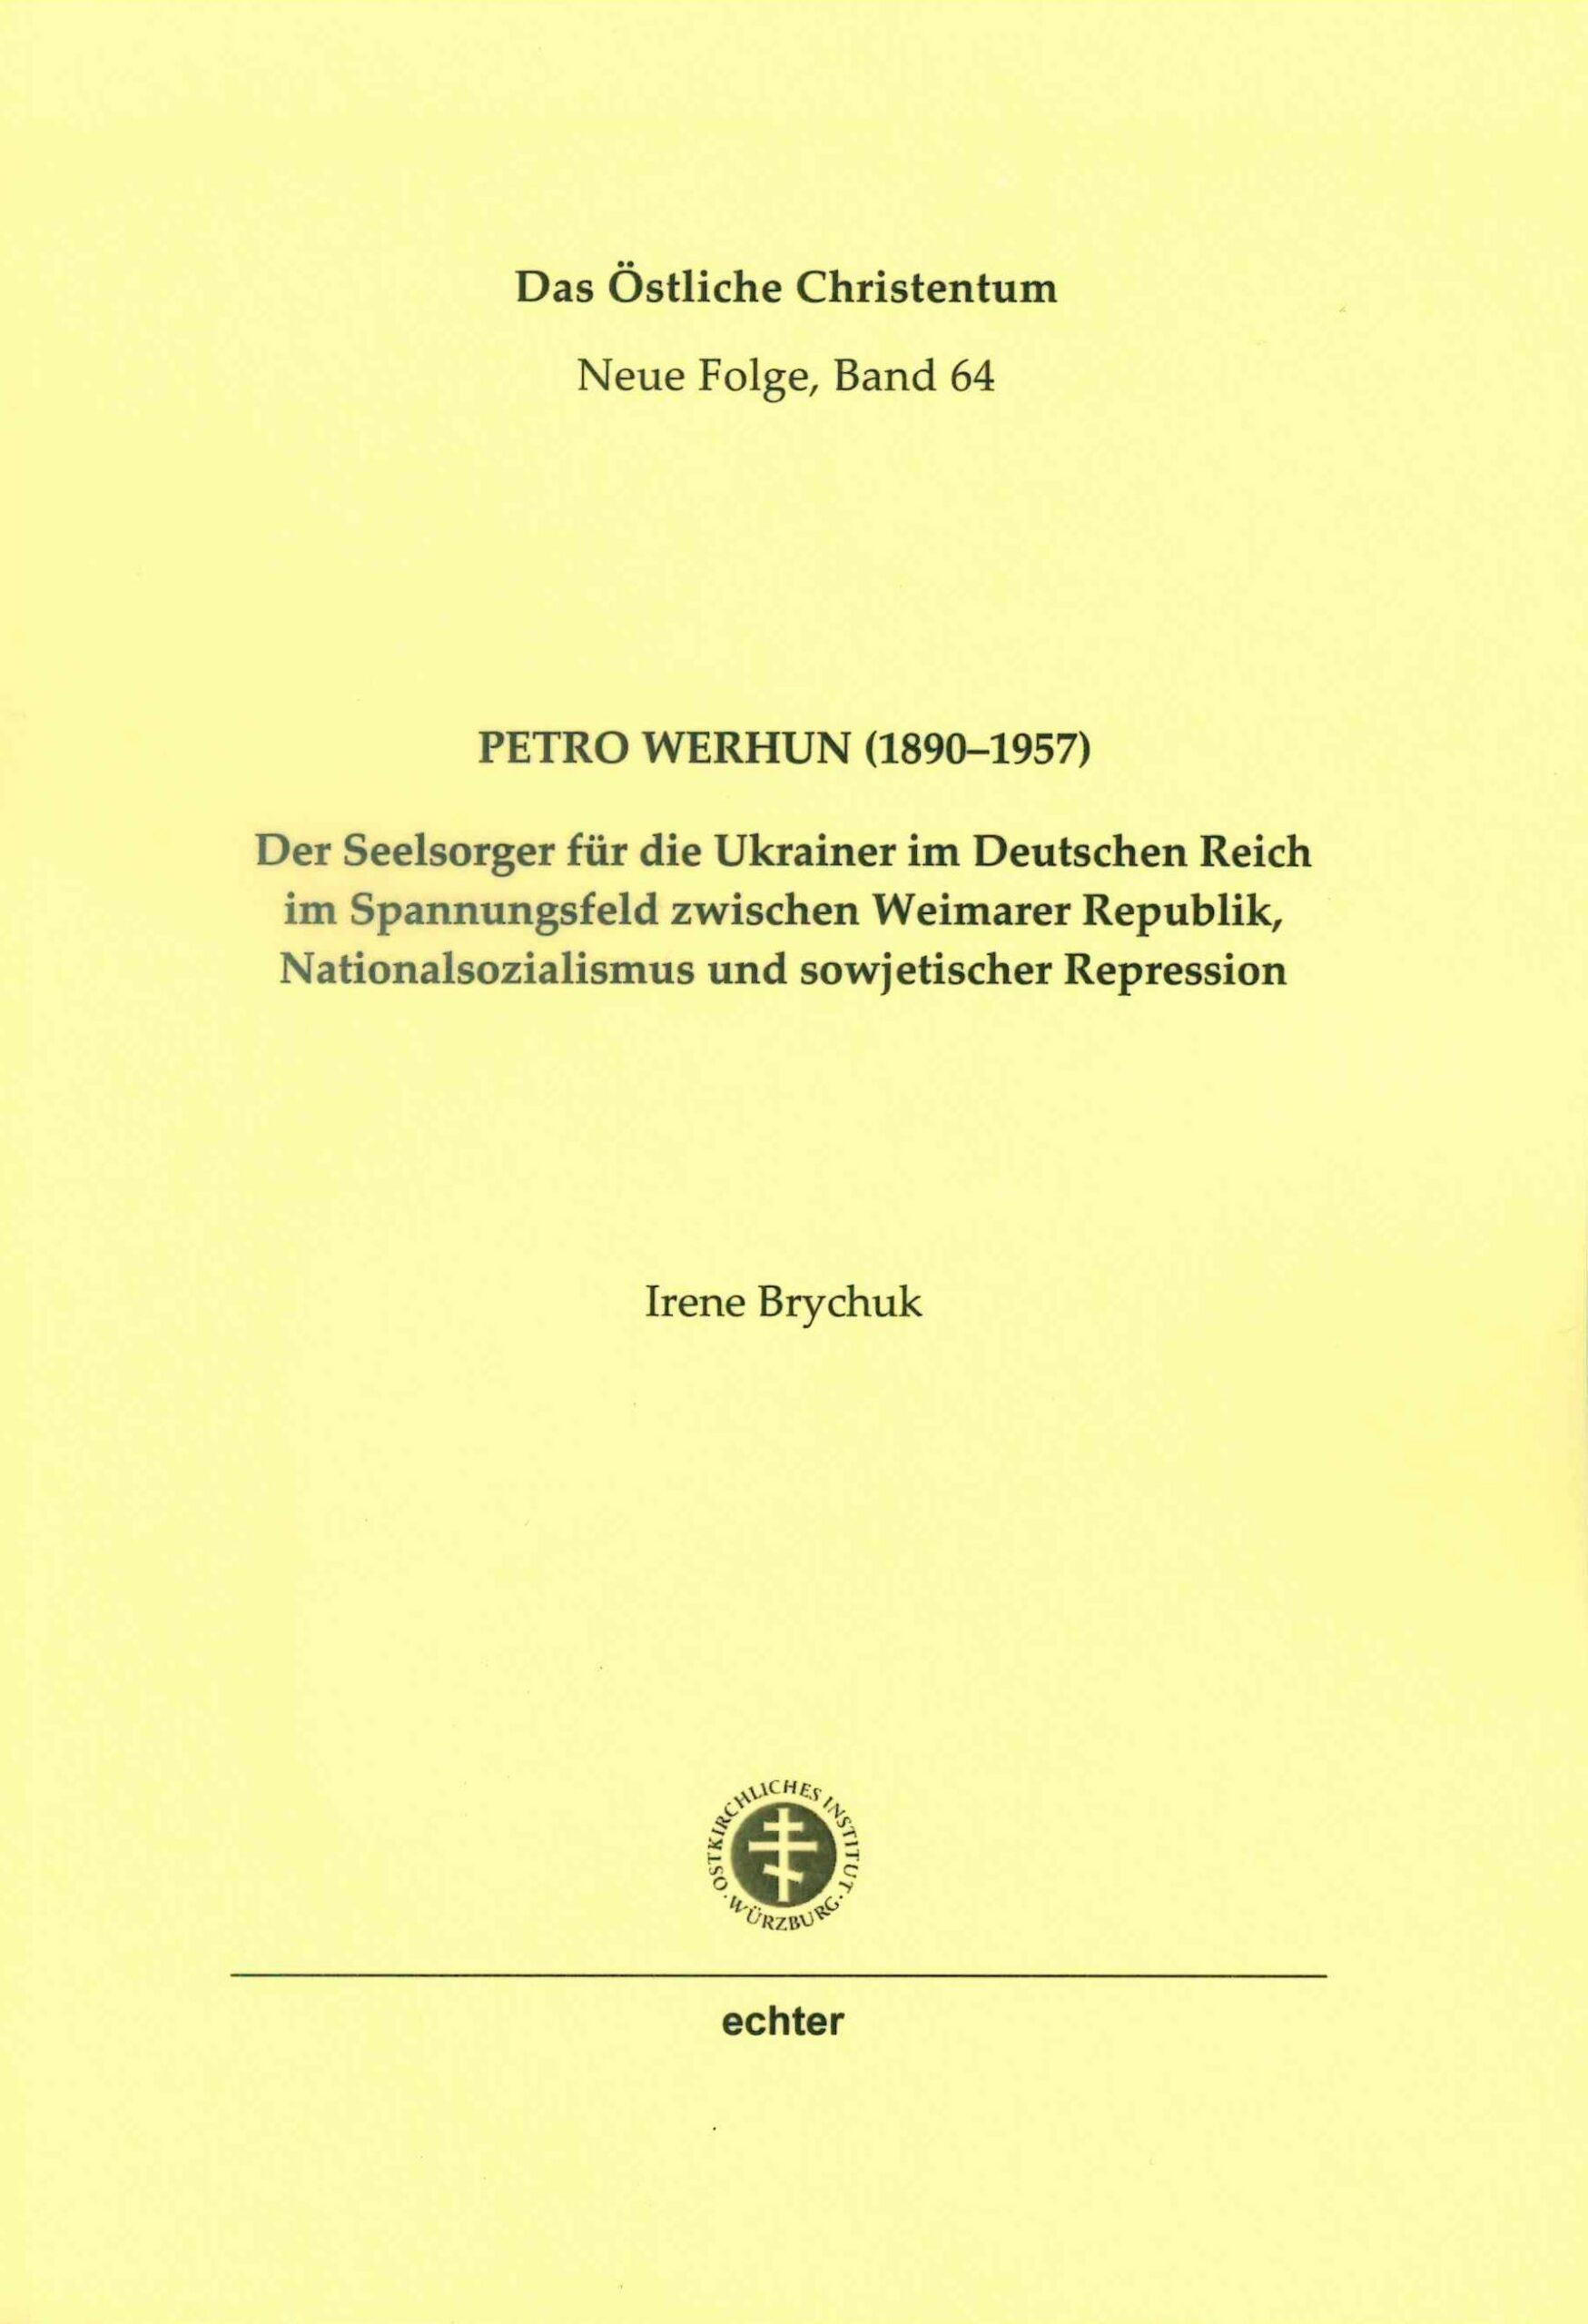 Buchcover Petro Werhun